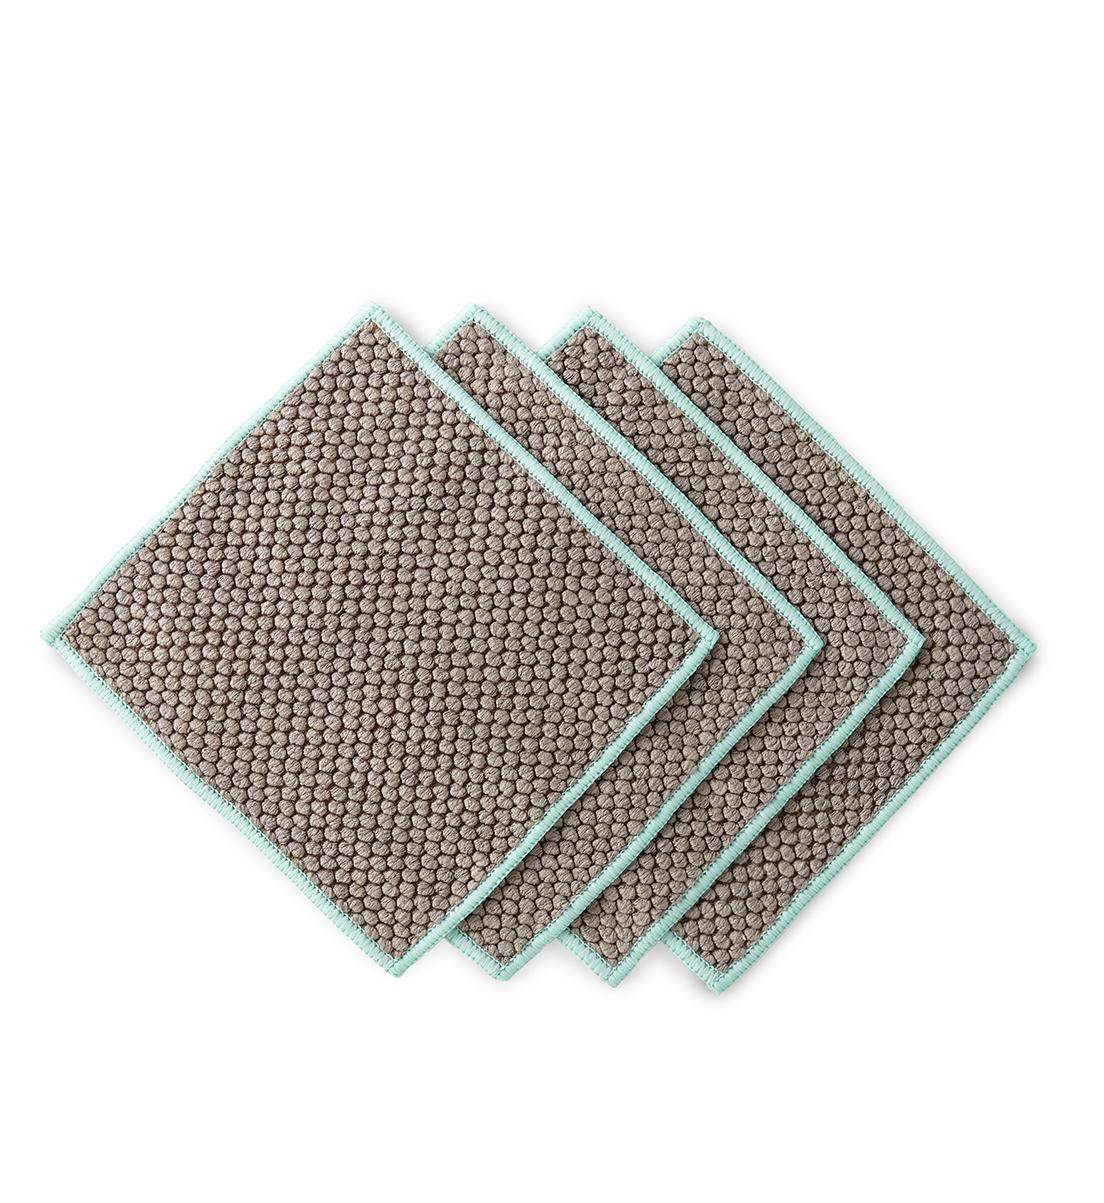 Counter Cloth Napkins, mushroom with sea mist trim